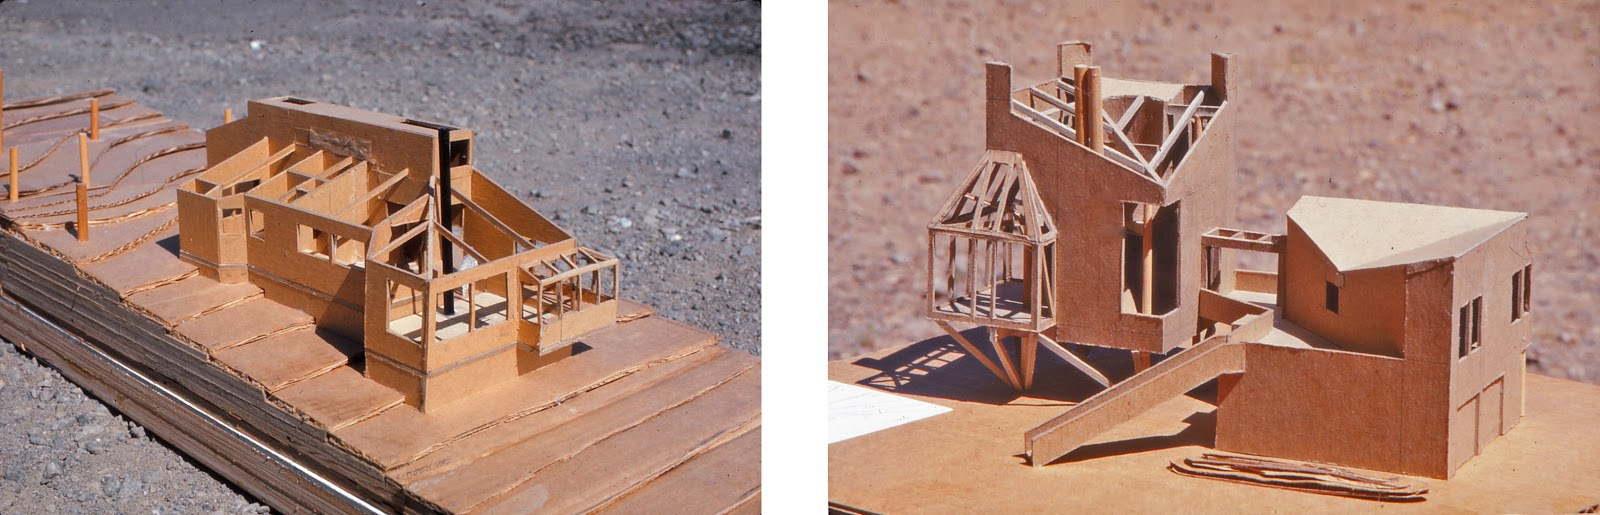 OBIE BOWMAN ARCHITECT FAIA MY JOURNAL: Study Models